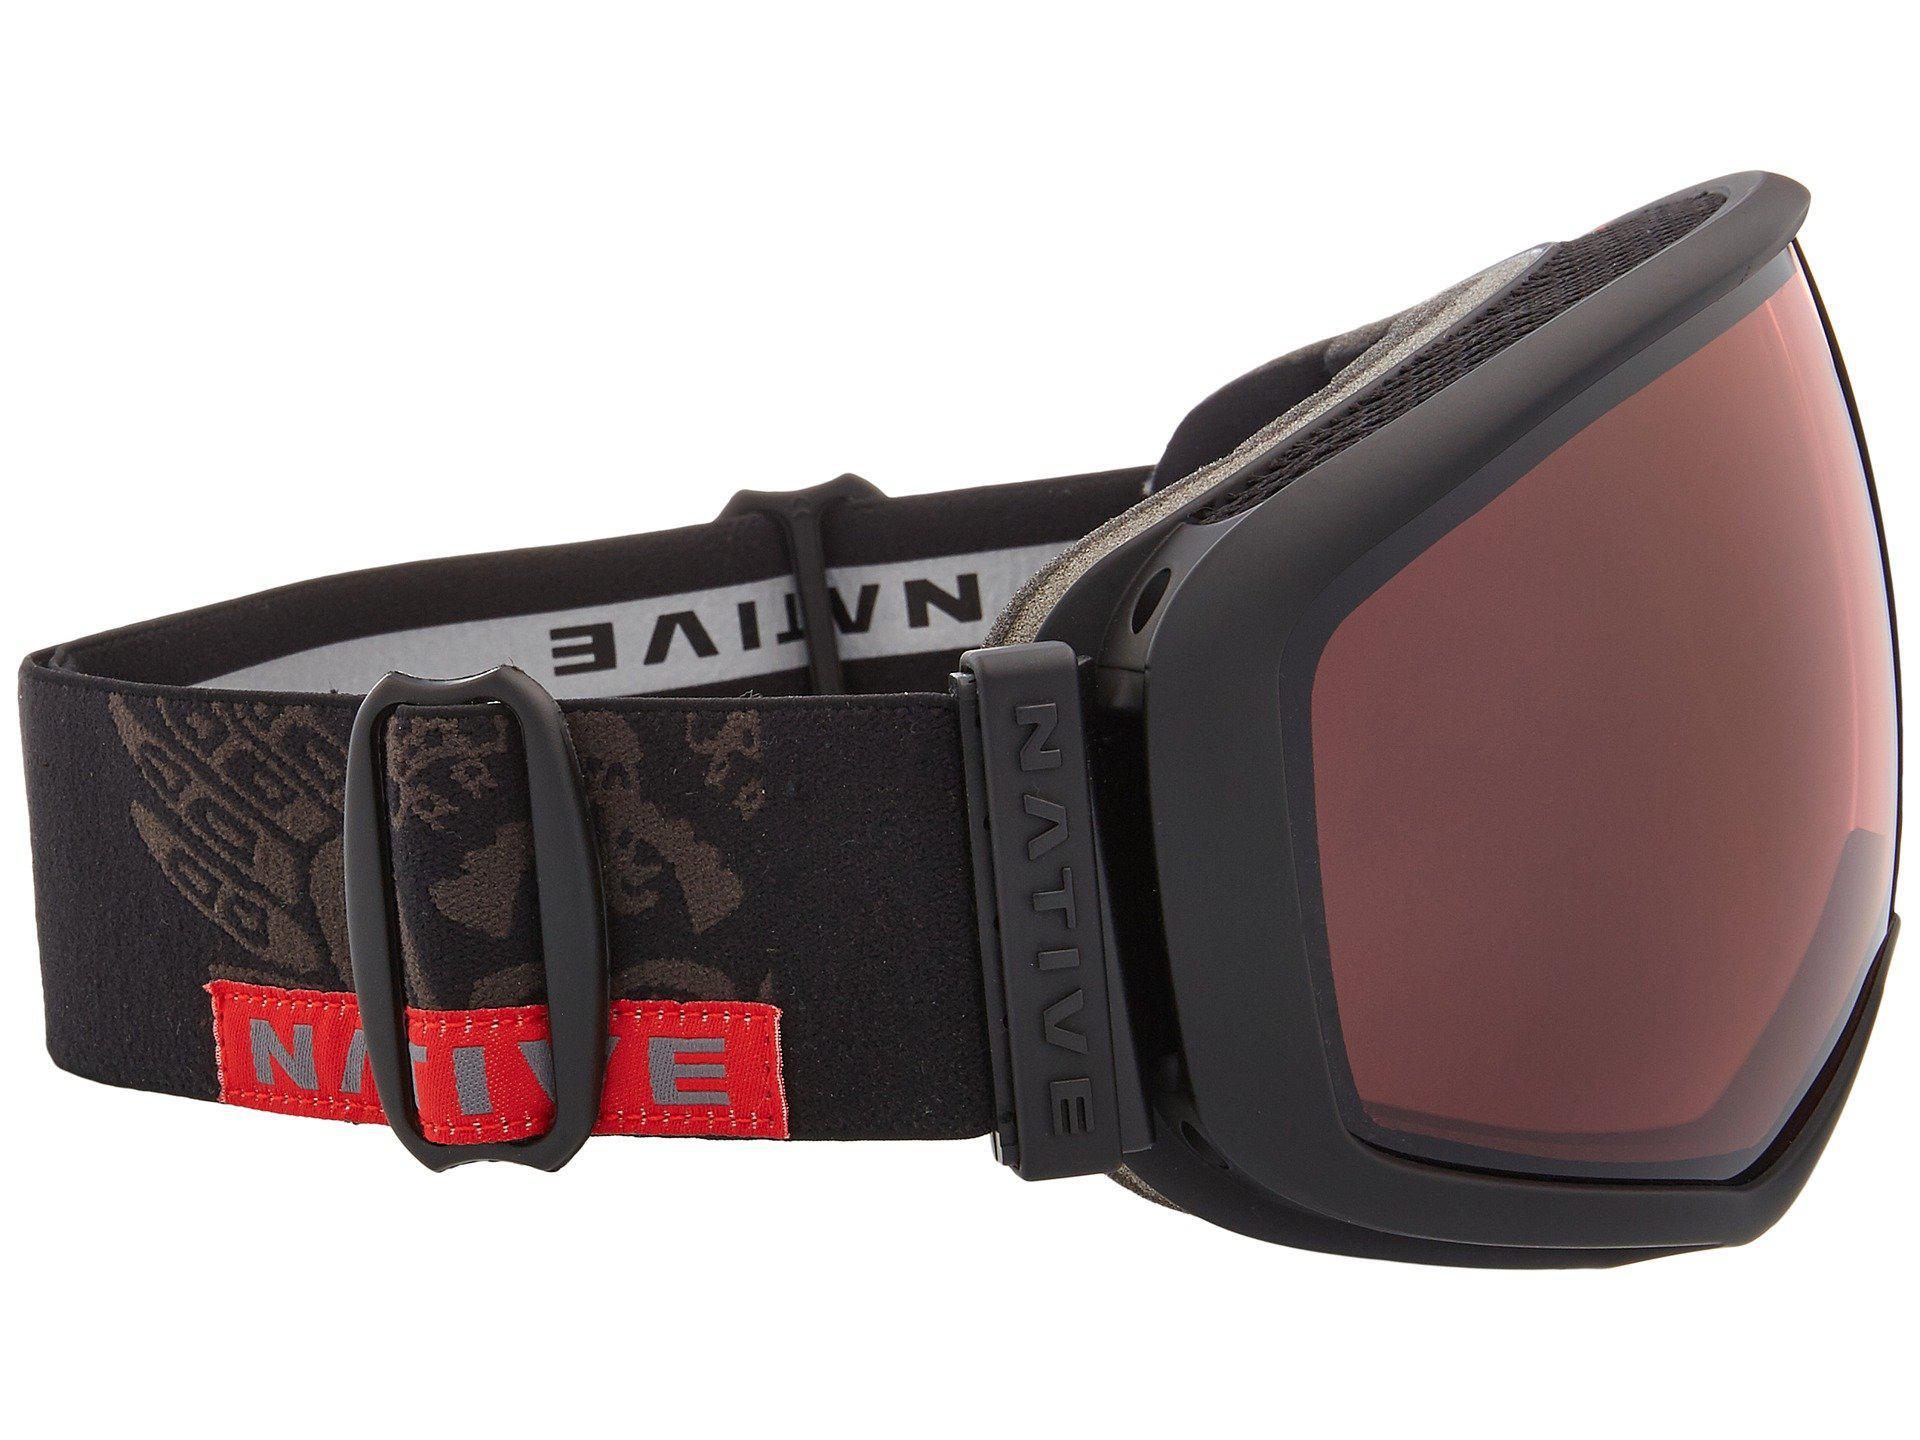 4b50e41936 Lyst - Native Eyewear Tank-7 (aluminum pink blue Reflex) Snow ...